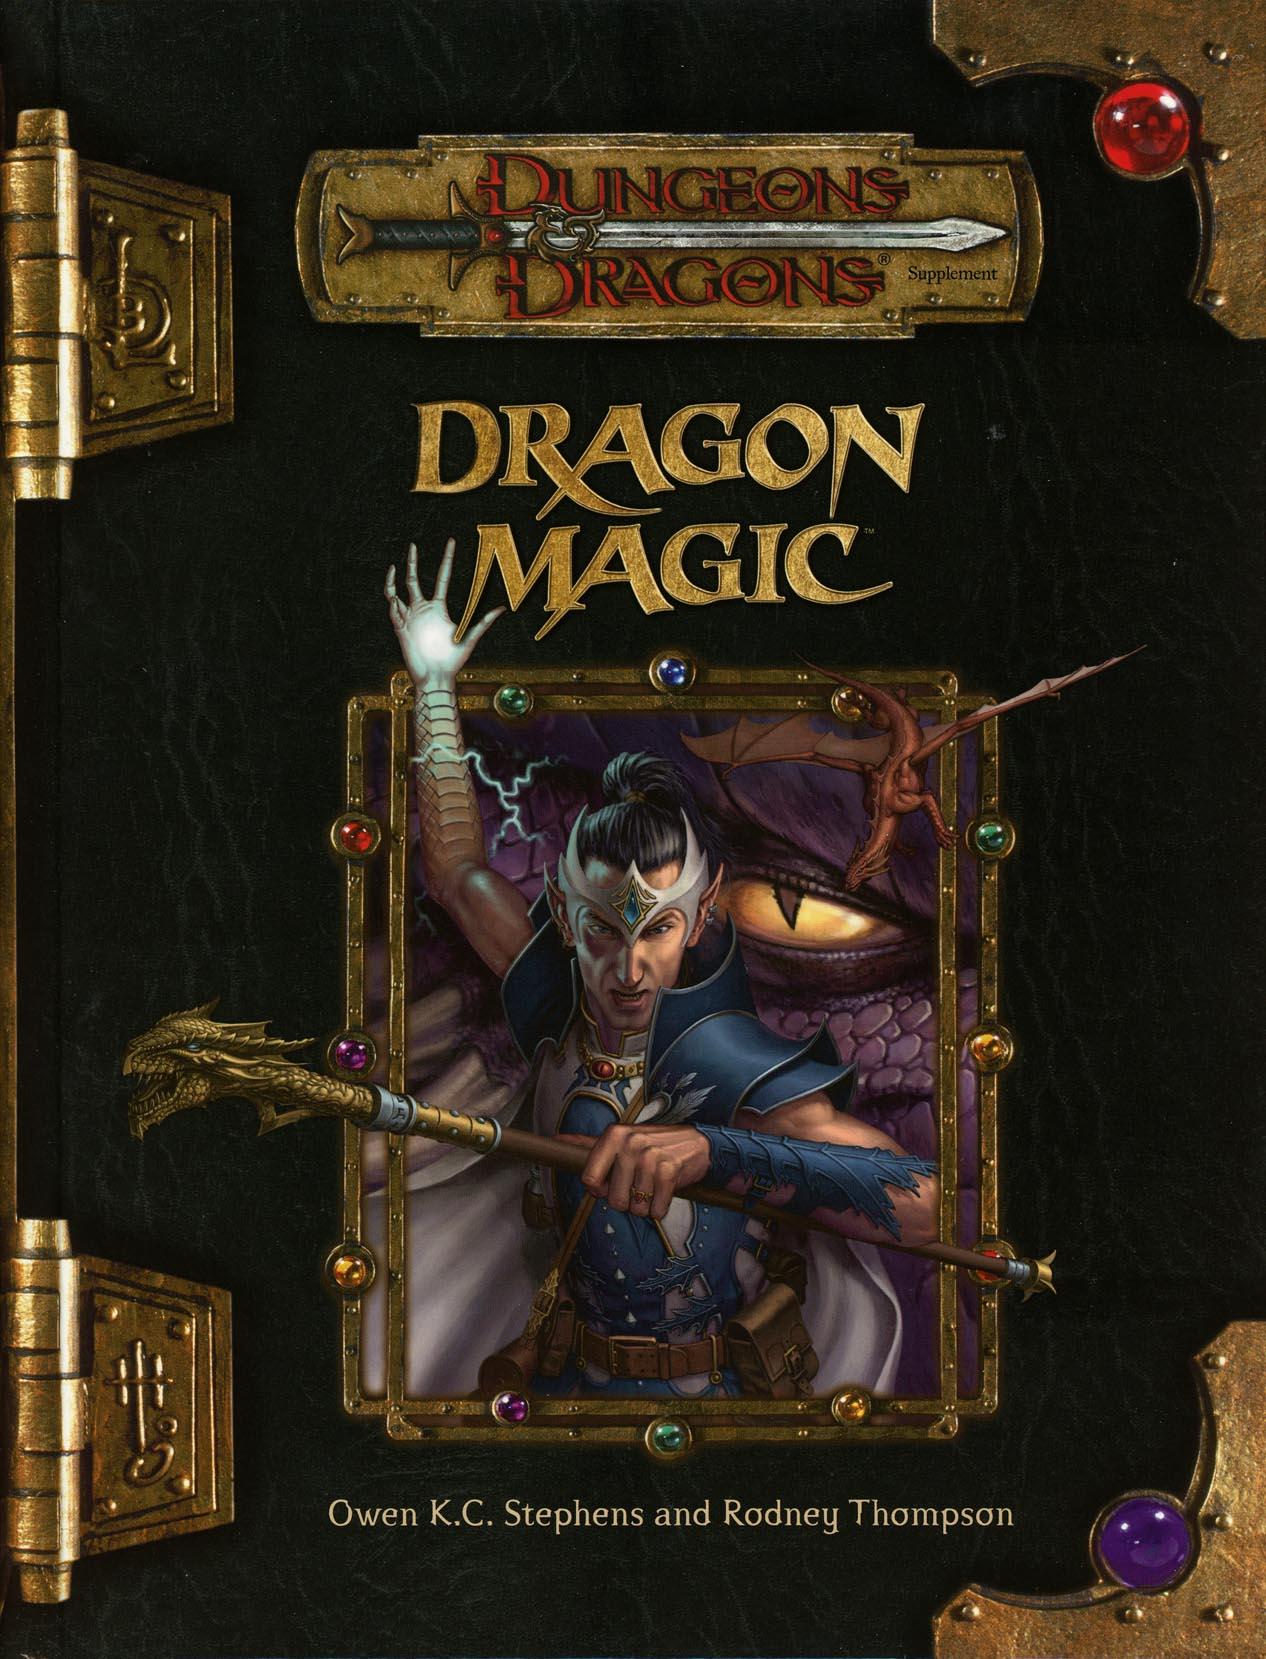 File:Dragon Magic cover.jpg